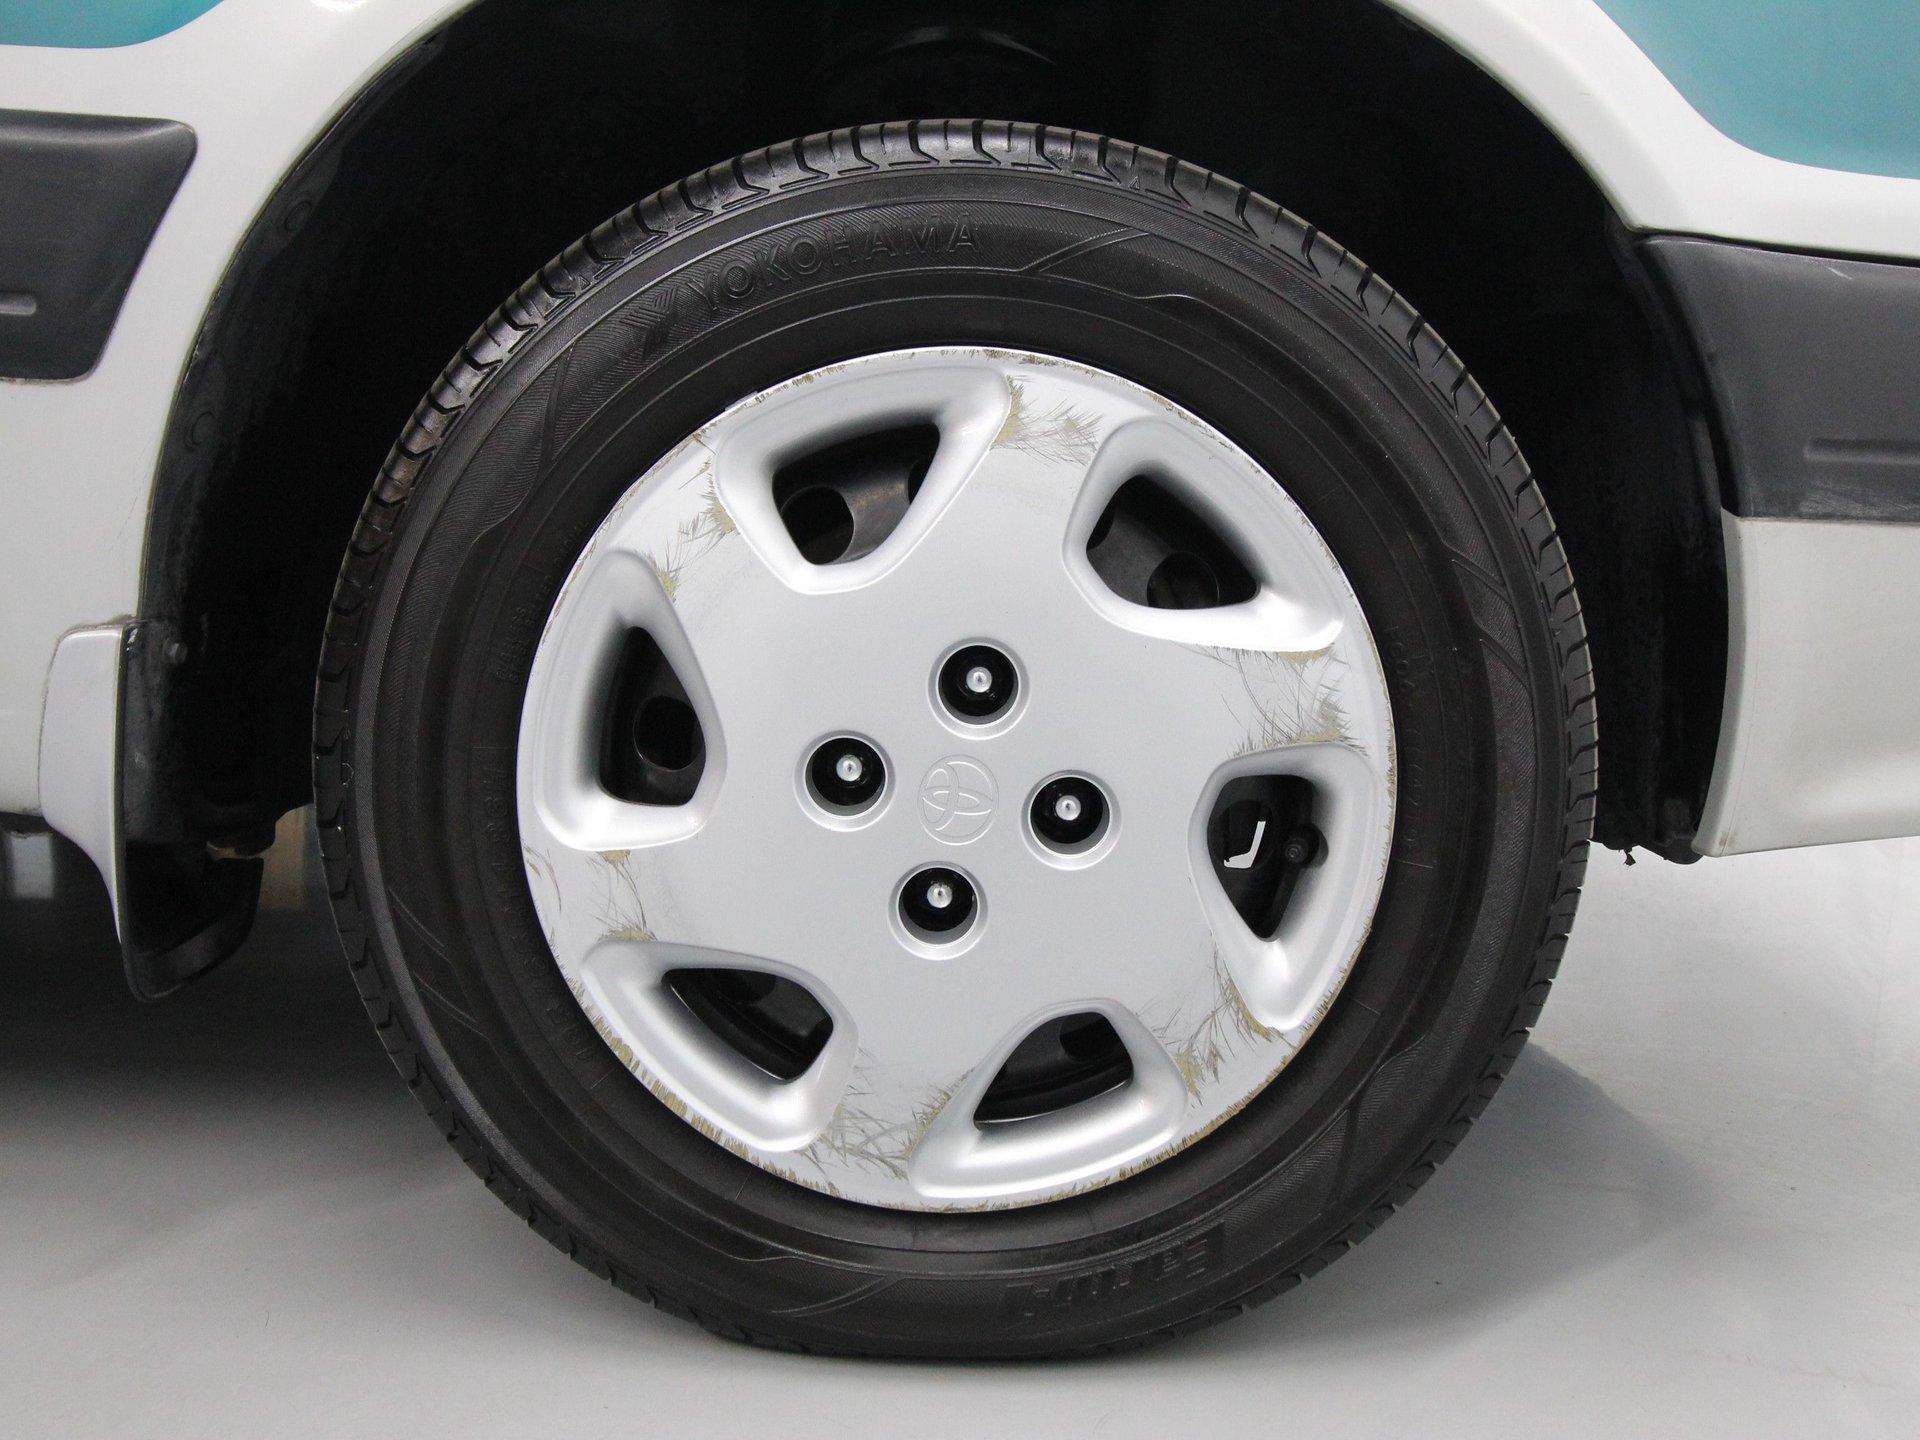 1995 Toyota Sprinter